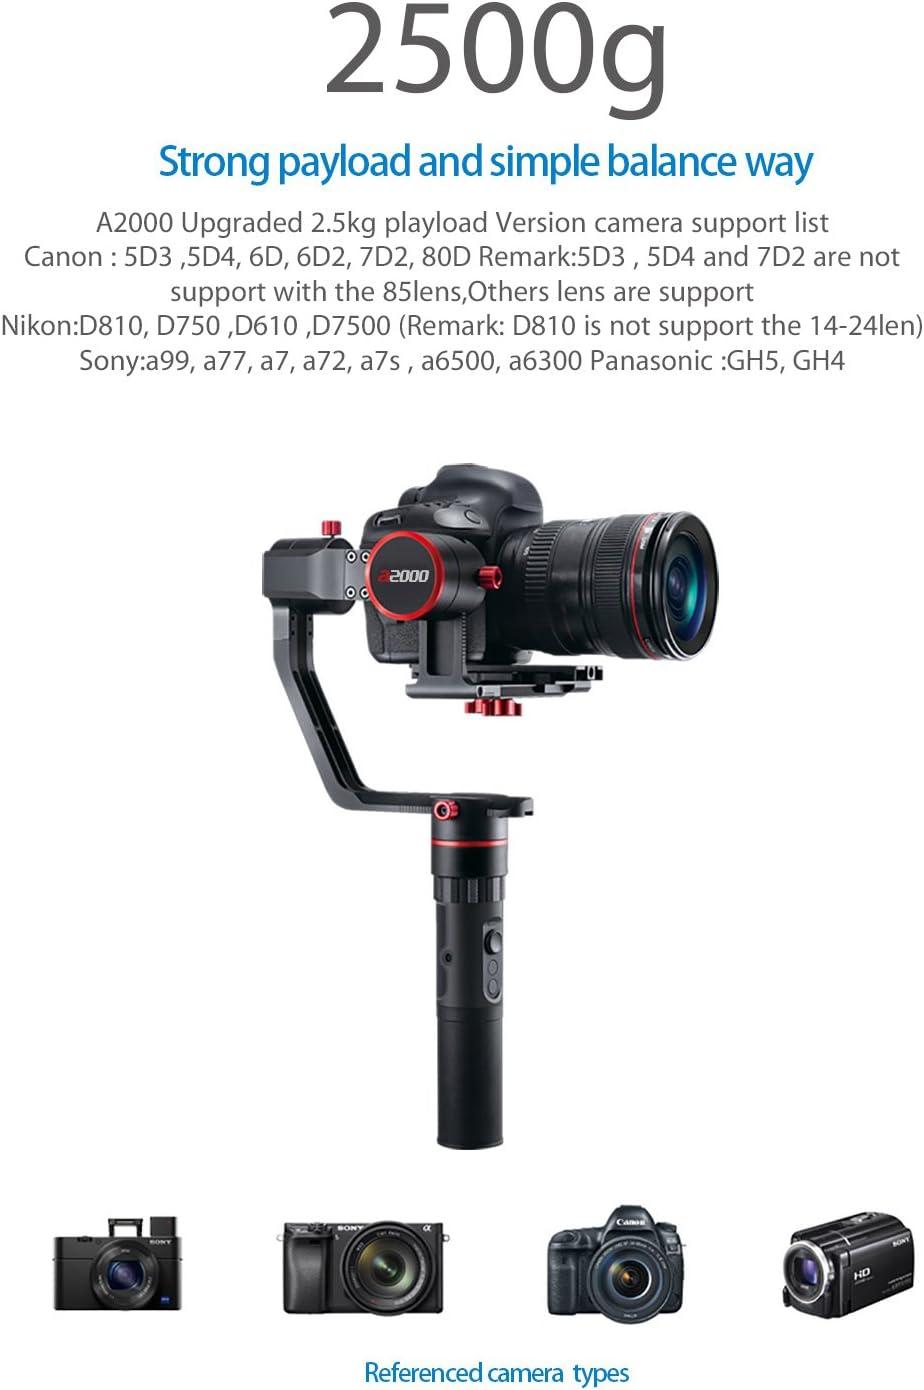 Feiyutech A2000 Upgraded Dual Grip Handle Kit Für Ony Kamera